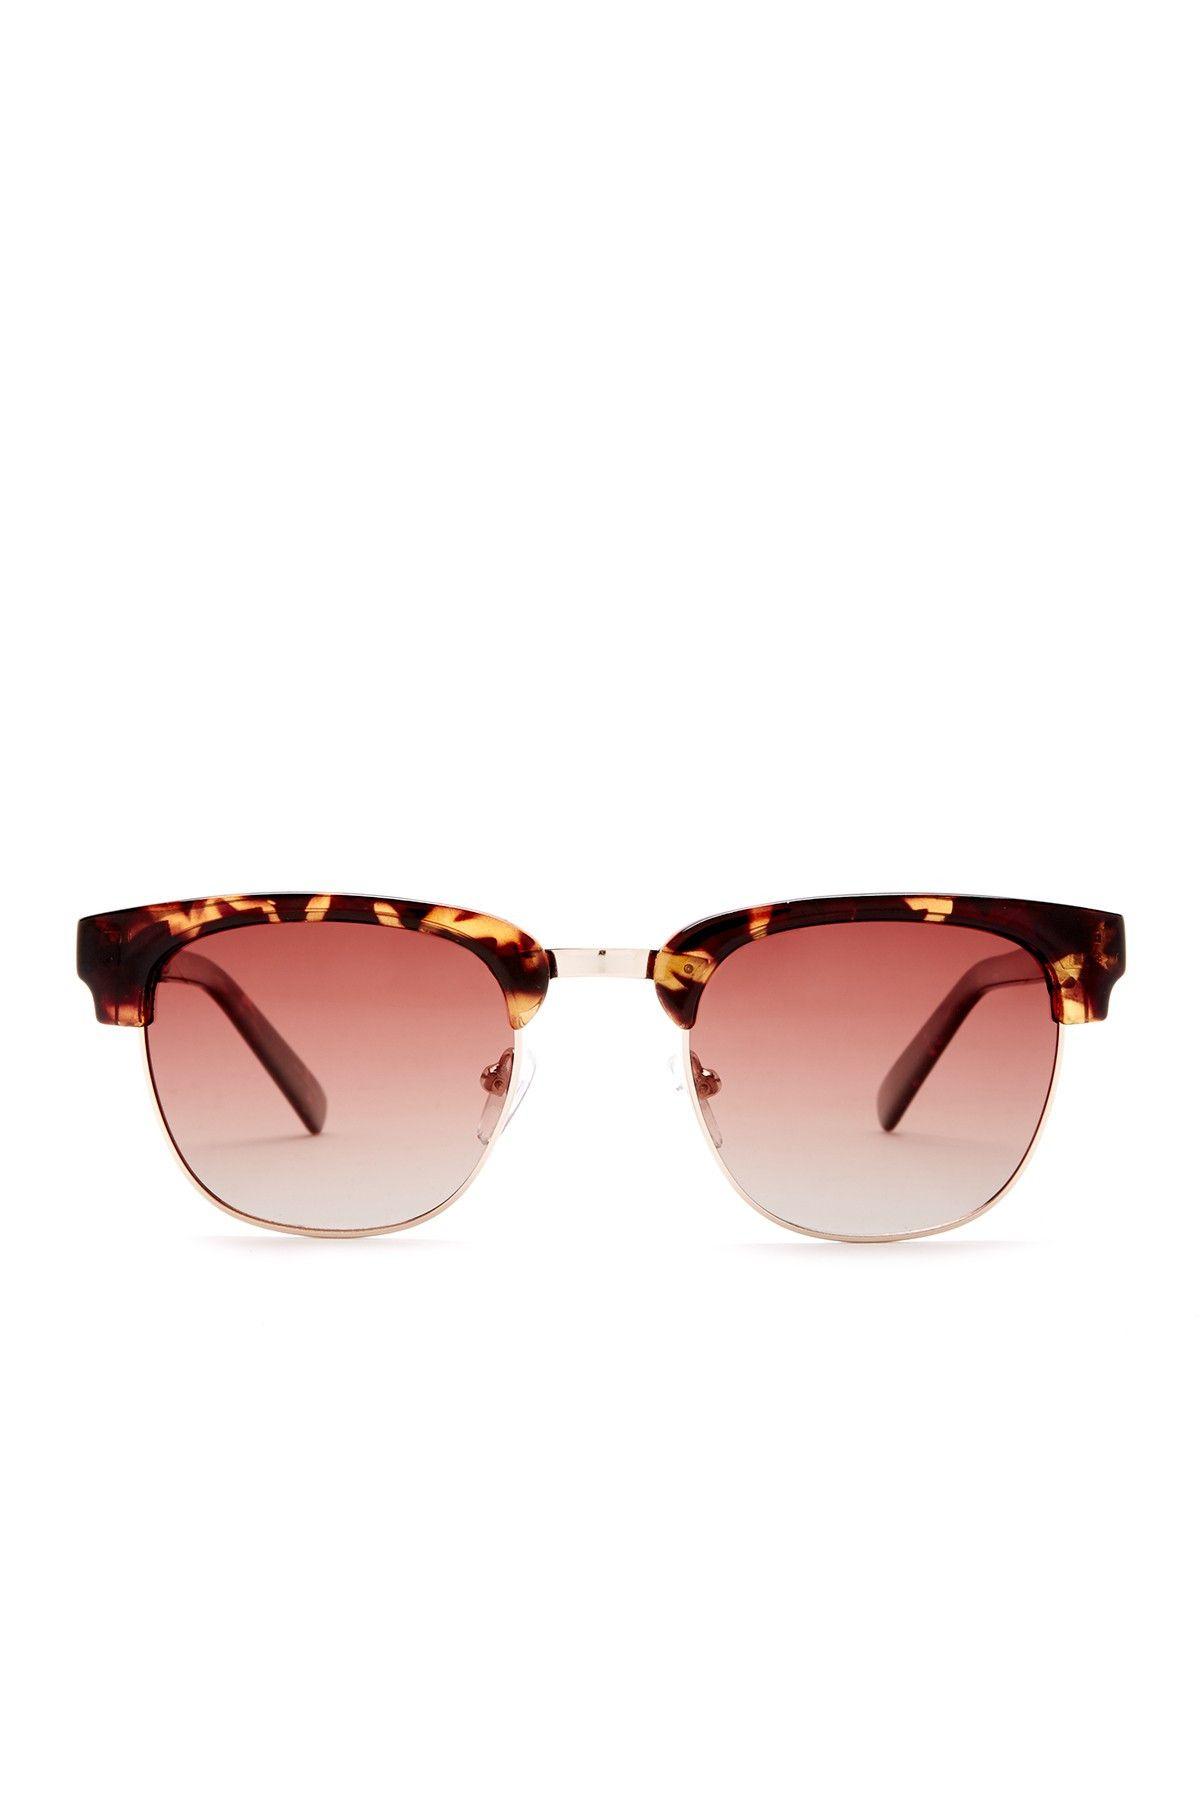 Cole haan womens wayfarer sunglasses cole haan women